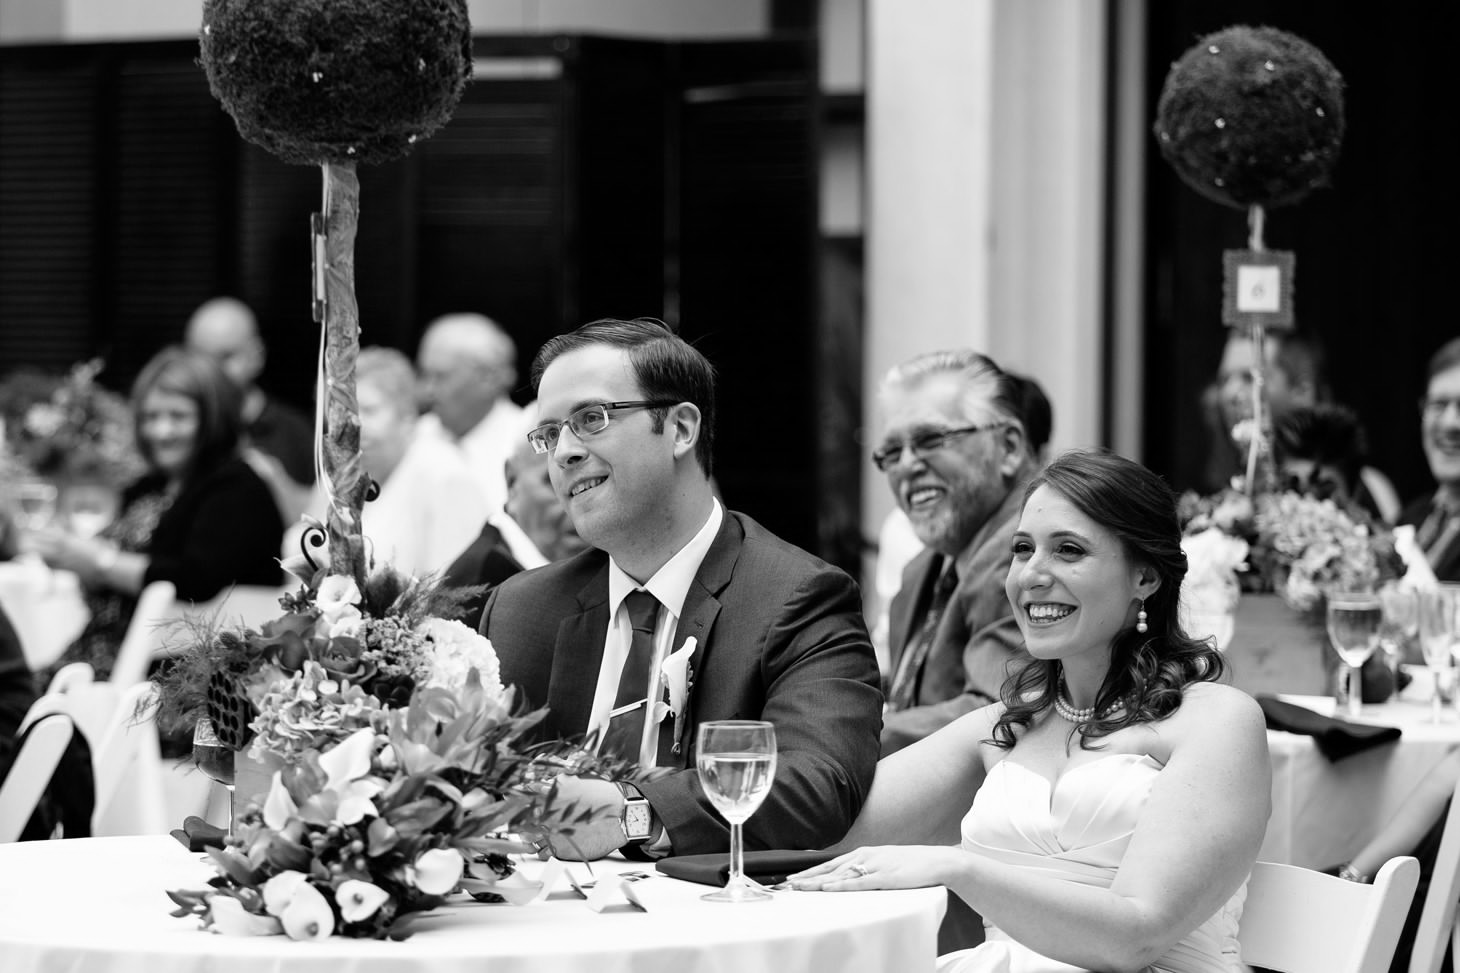 070-nyc-wedding-photographer-hoboken-waterfront-wedding-photos-smitten-chickens.jpg